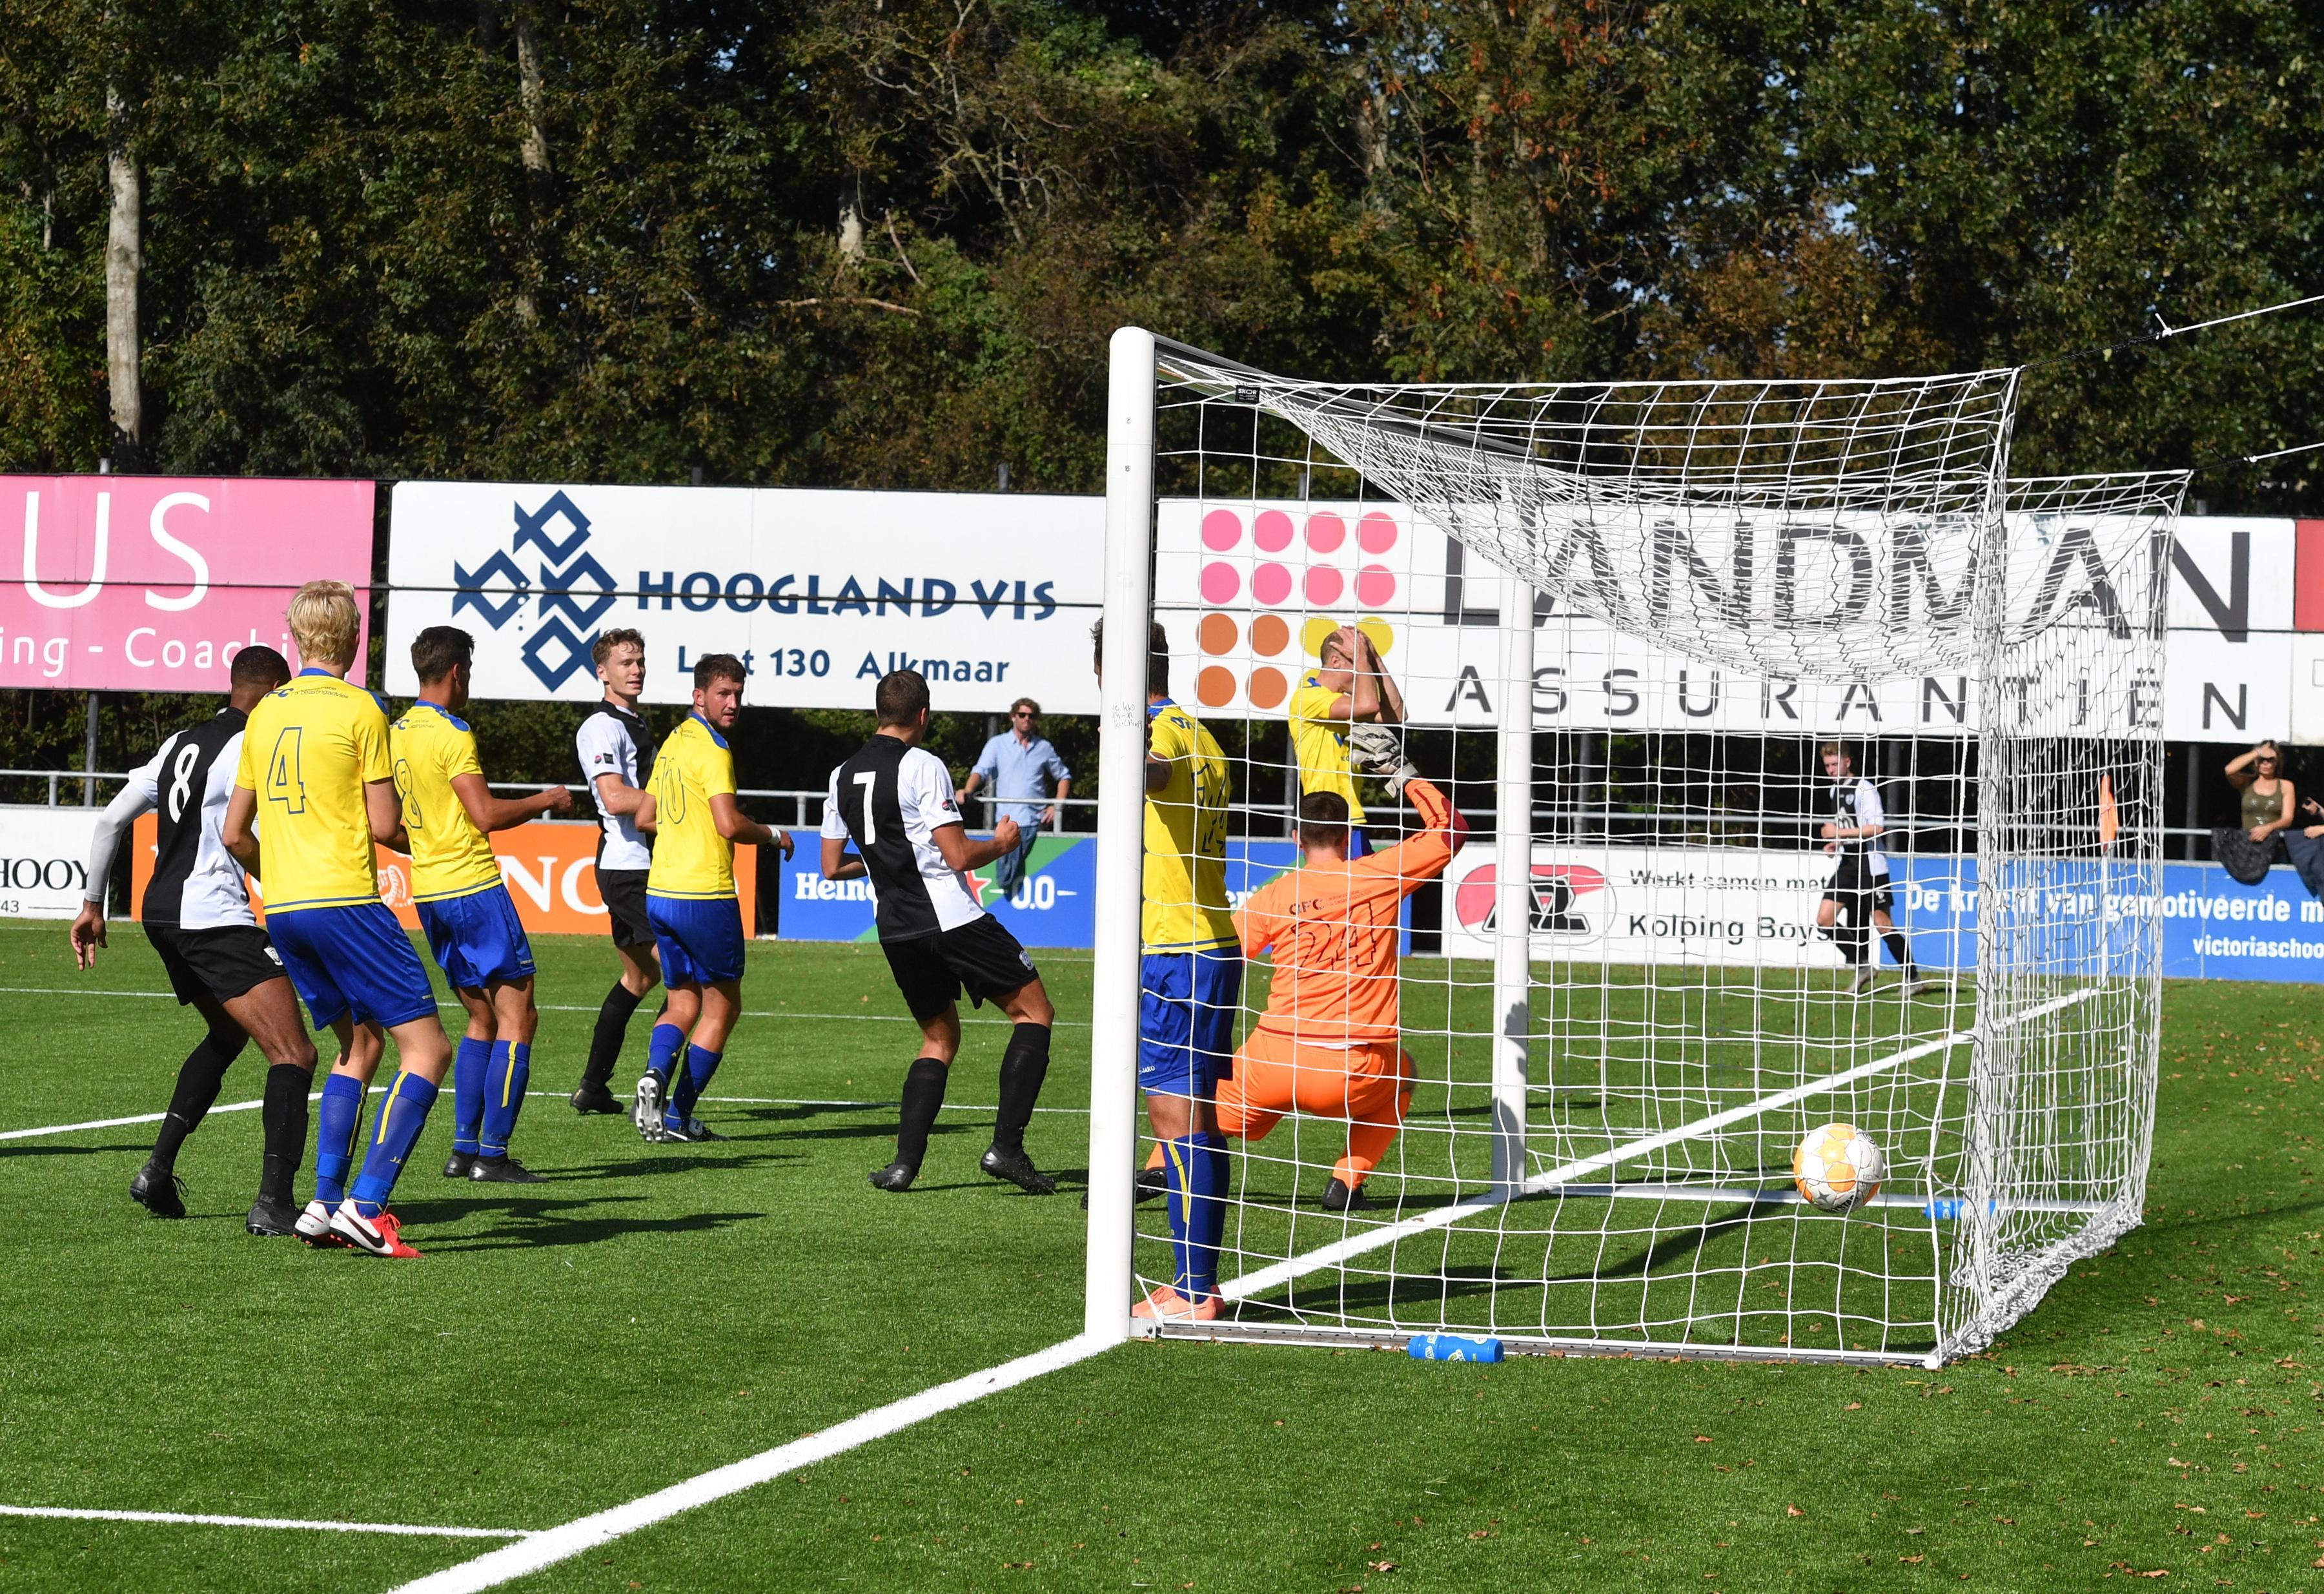 Oud-prof Mark de Vries wil jonge groep van Kolping Boys eerste klasse waardig maken en begint met moeizame thuiszege op LSVV